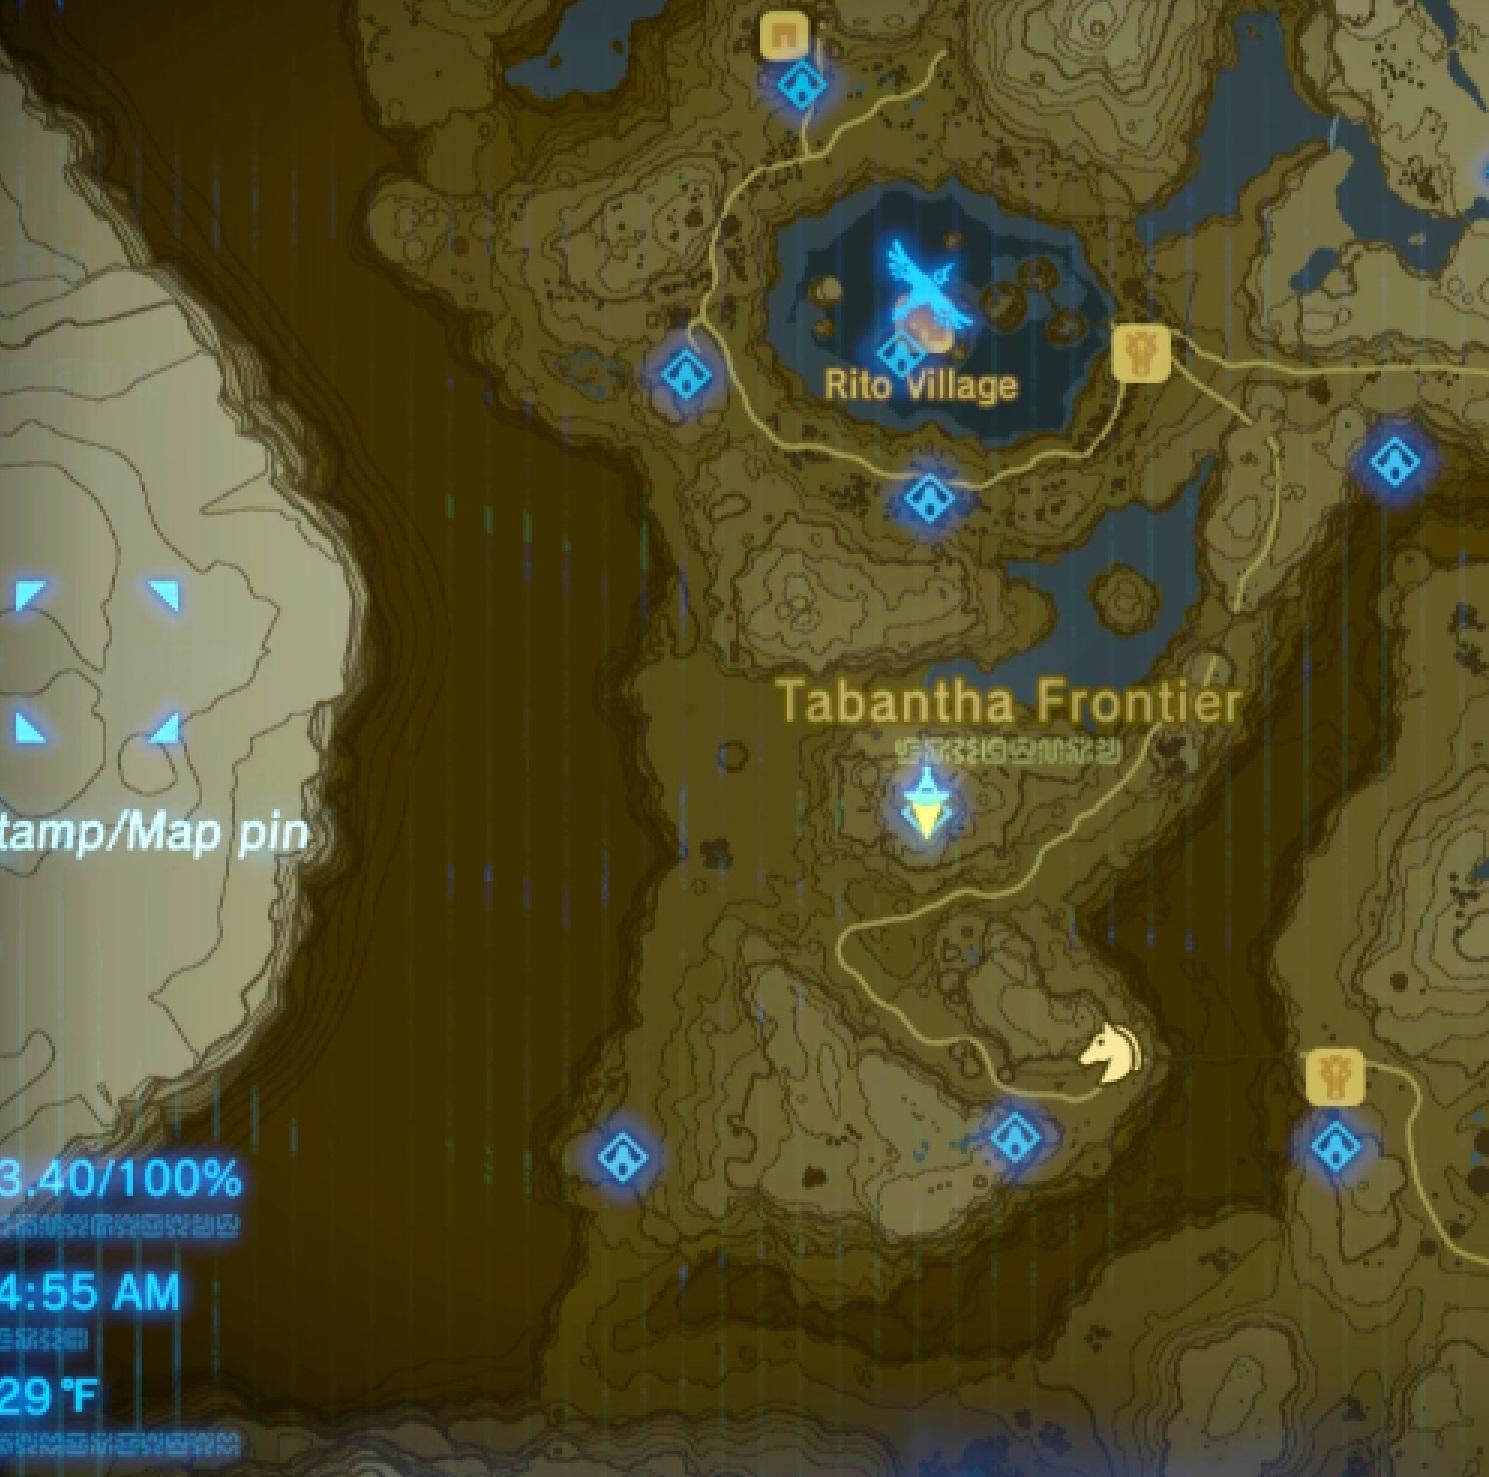 Tabantha Frontier Zeldapedia Fandom Powered By Wikia